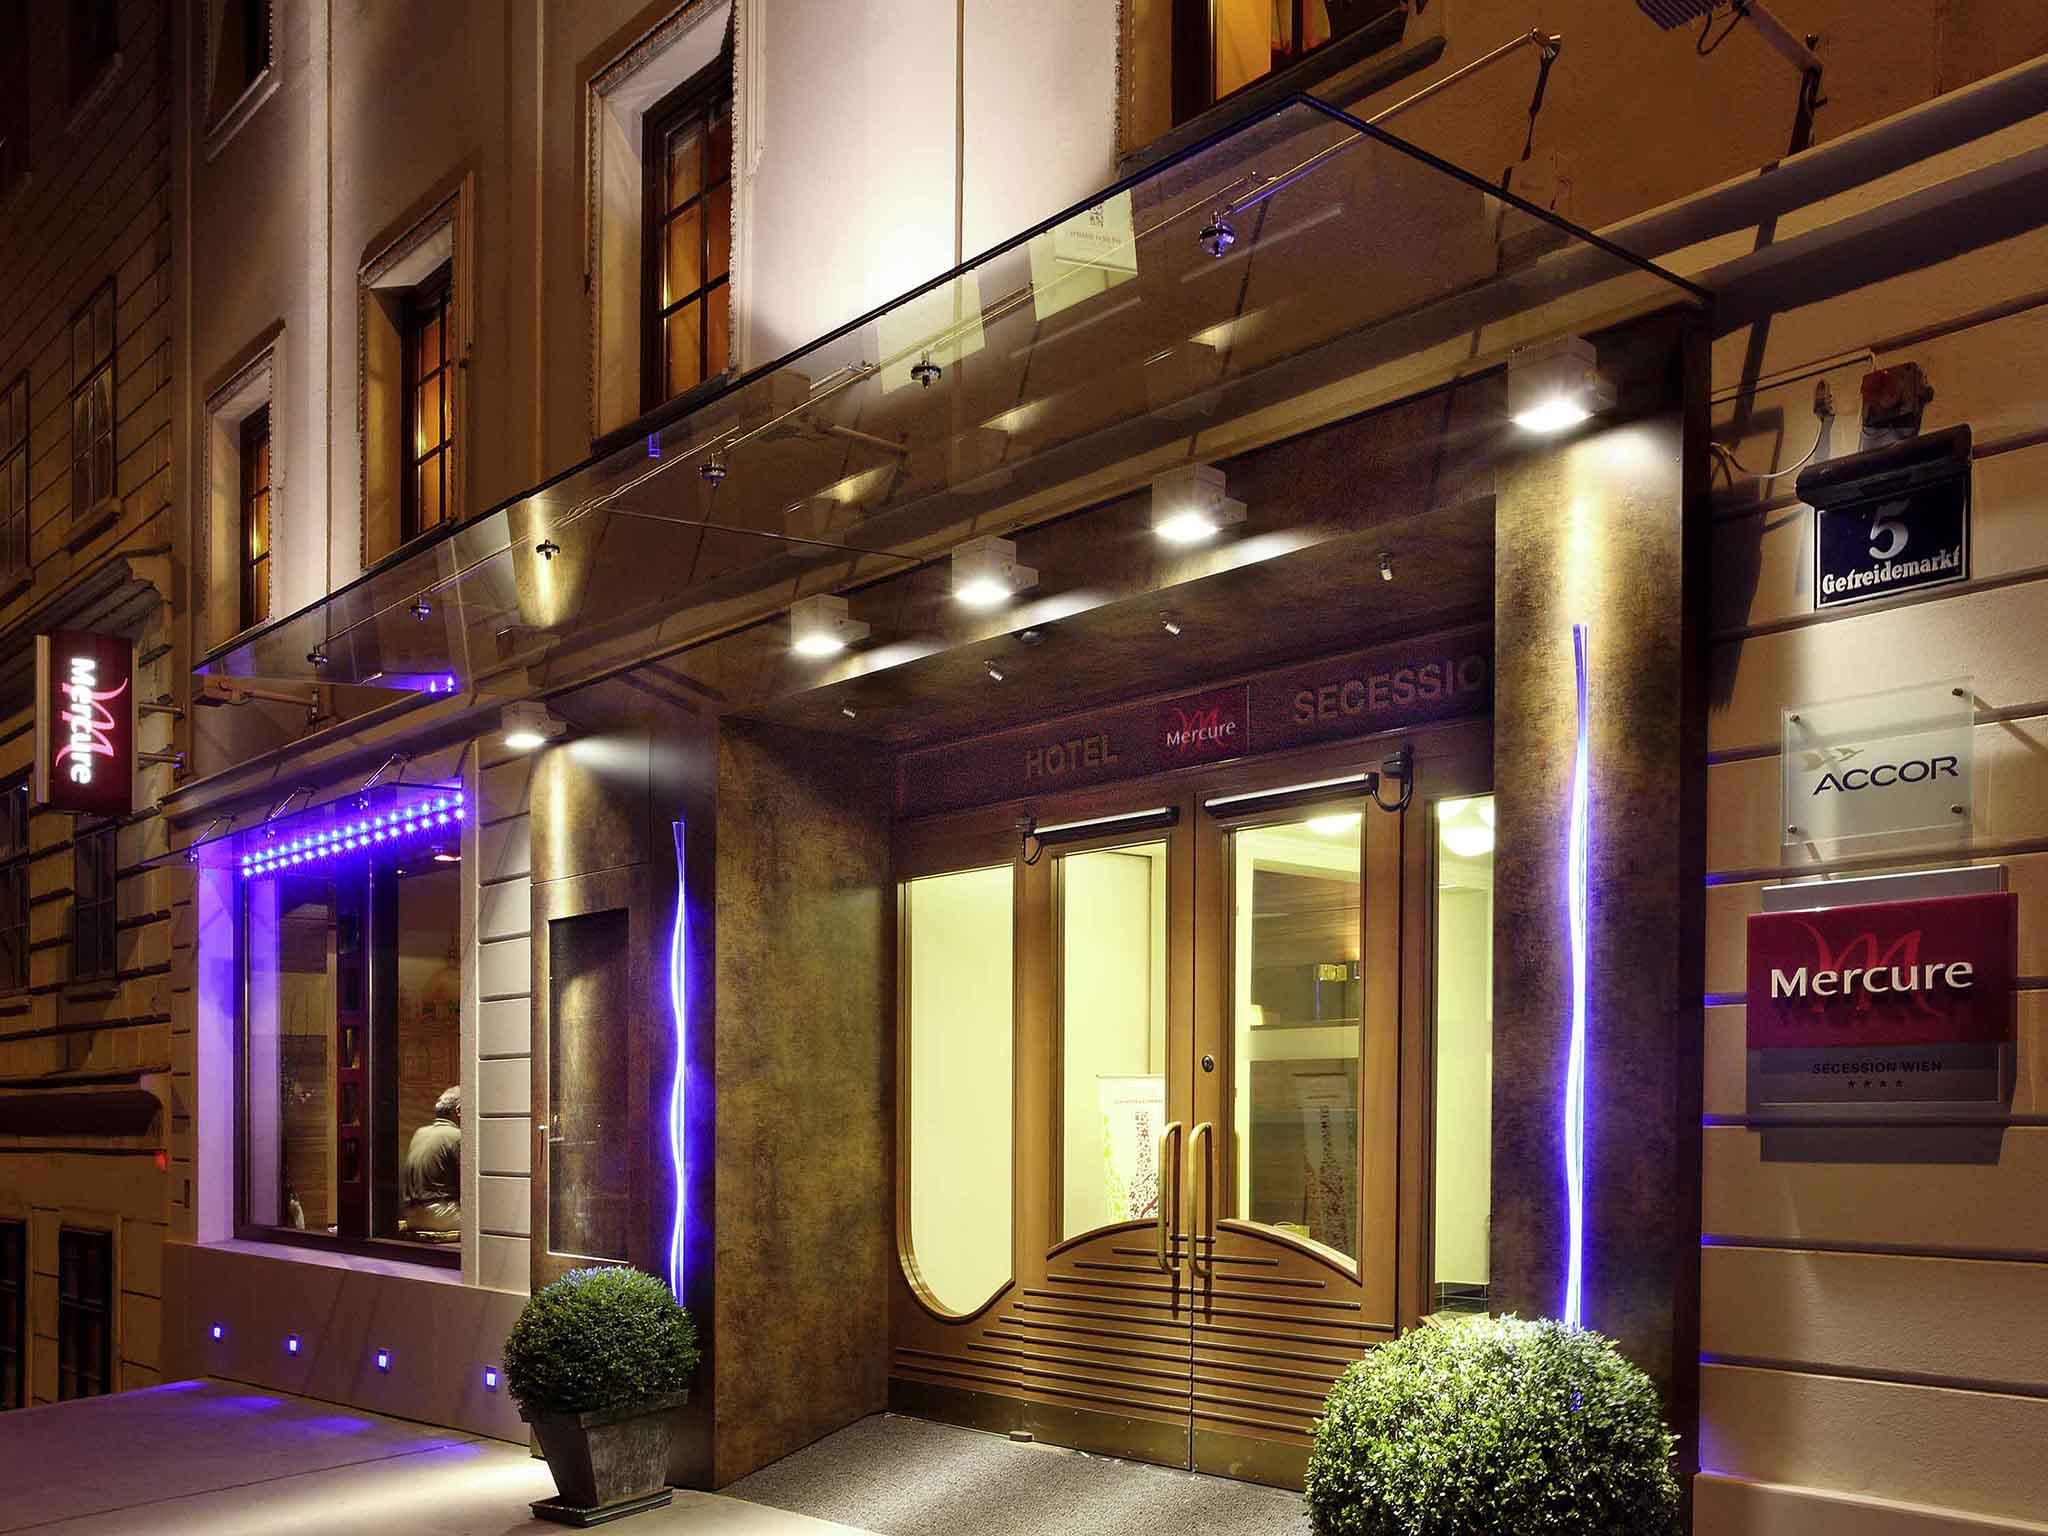 Hotel - Hotel Mercure Secession Wien